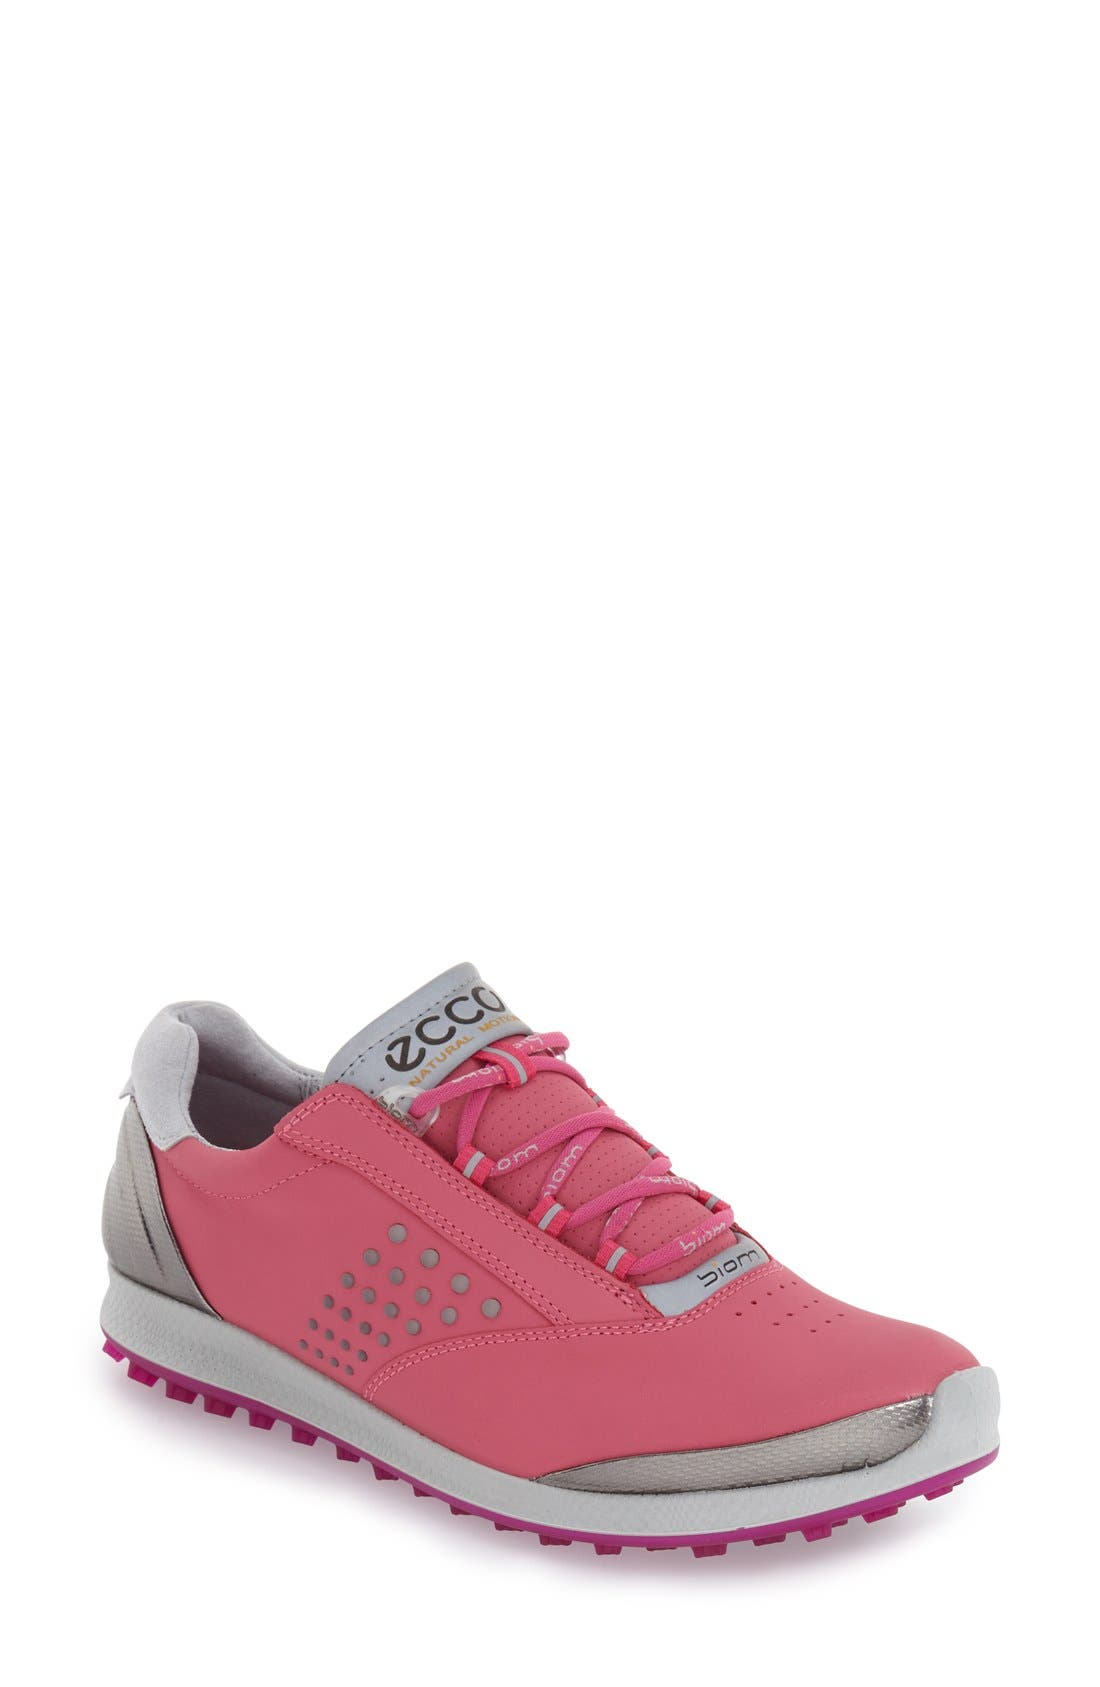 'BIOM' Hydromax<sup>®</sup> Waterproof Golf Shoe,                             Main thumbnail 8, color,